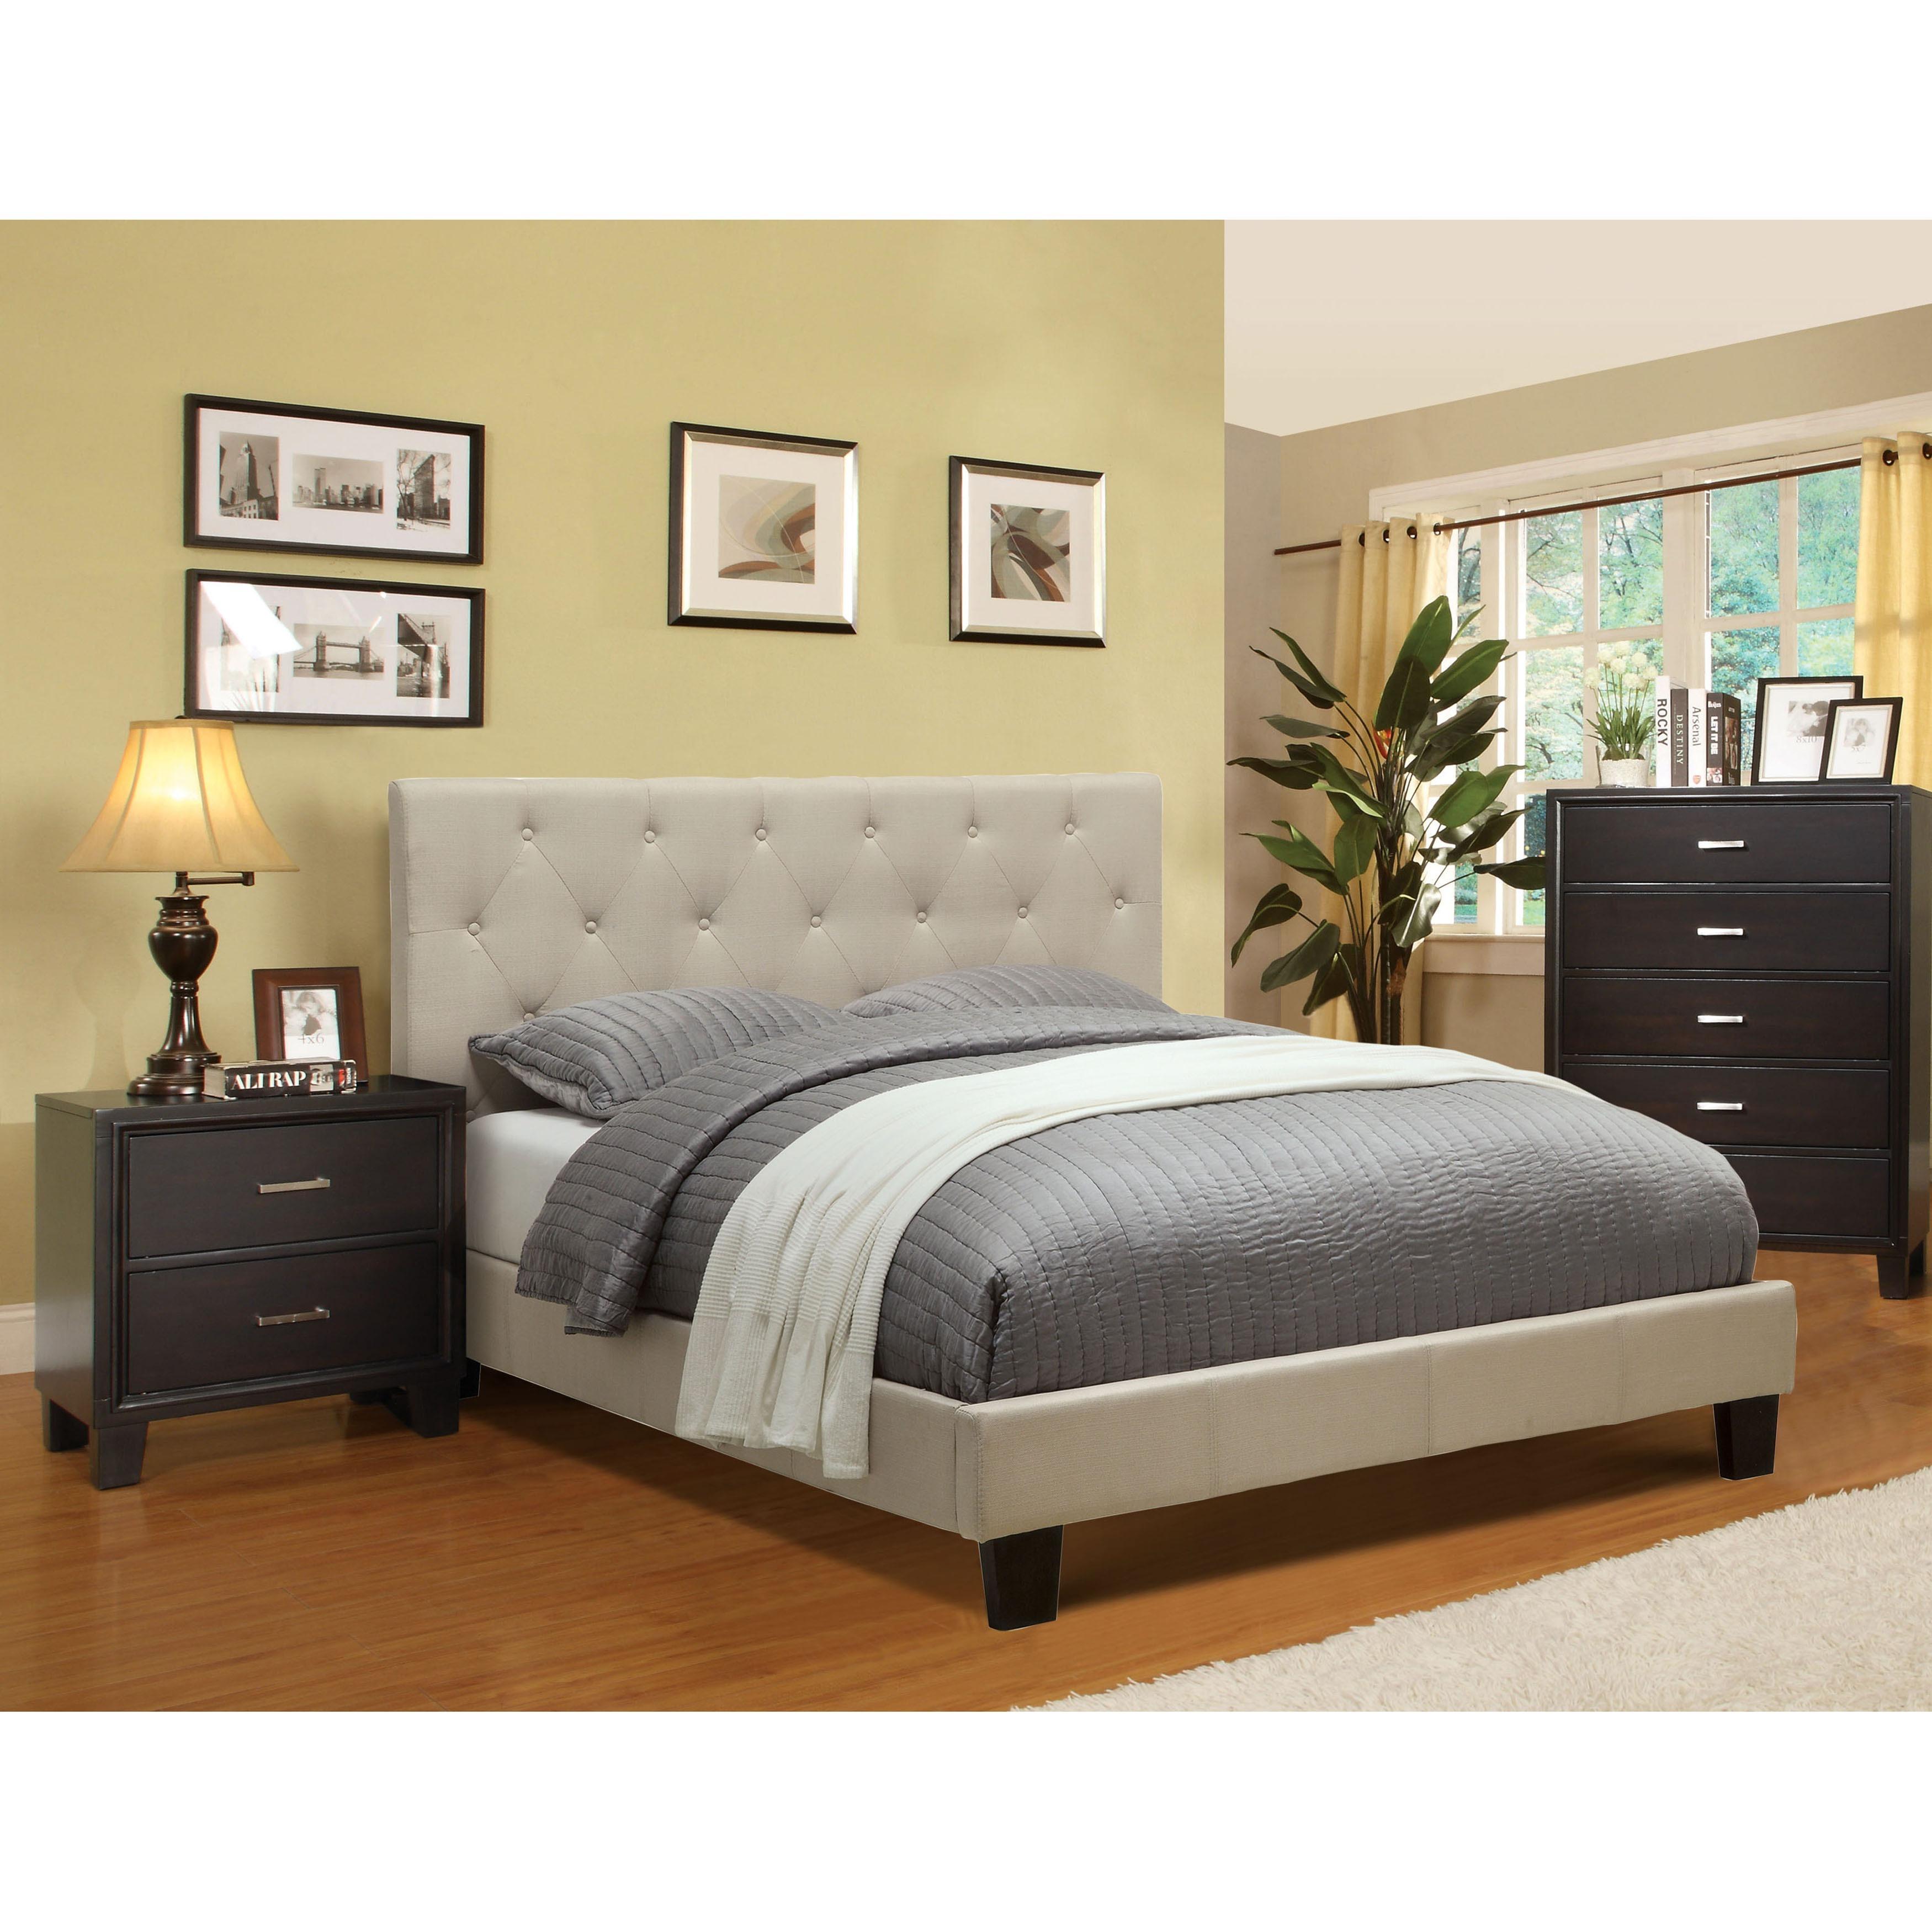 Furniture of America Perdella 3-piece Ivory Low Profile Bedroom ...